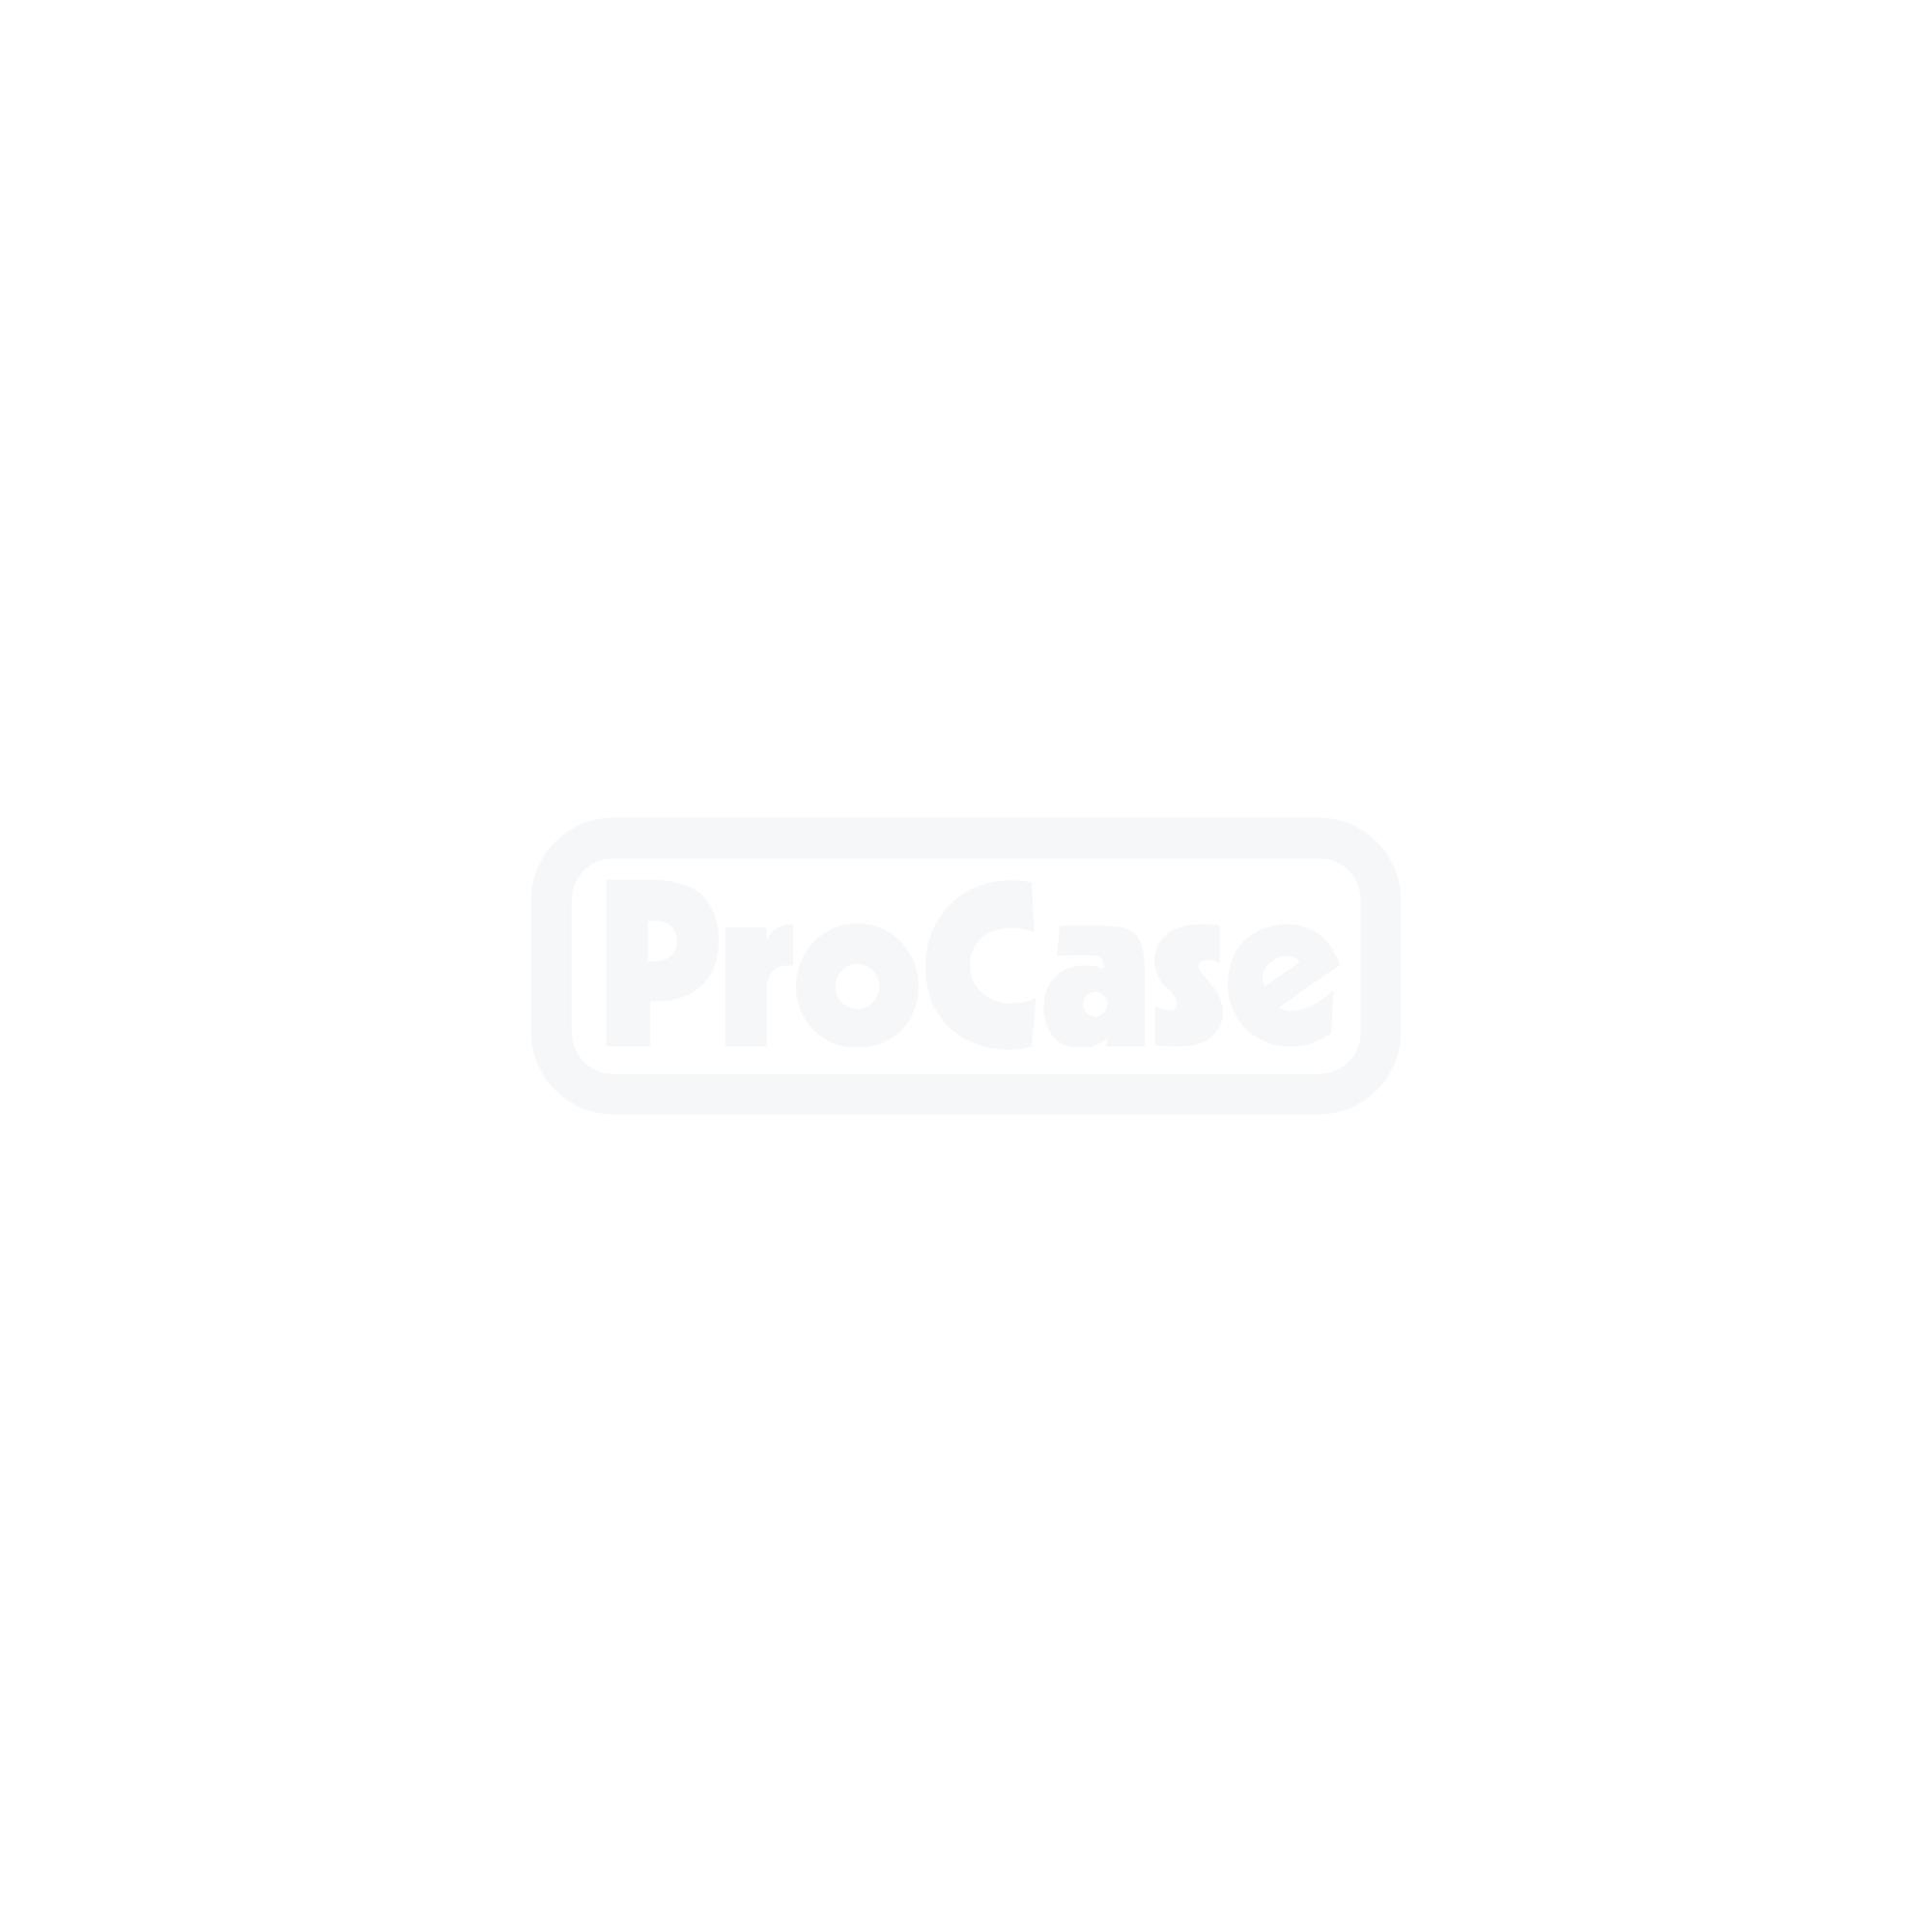 Stativ-Case / Hardware-Case 160 2